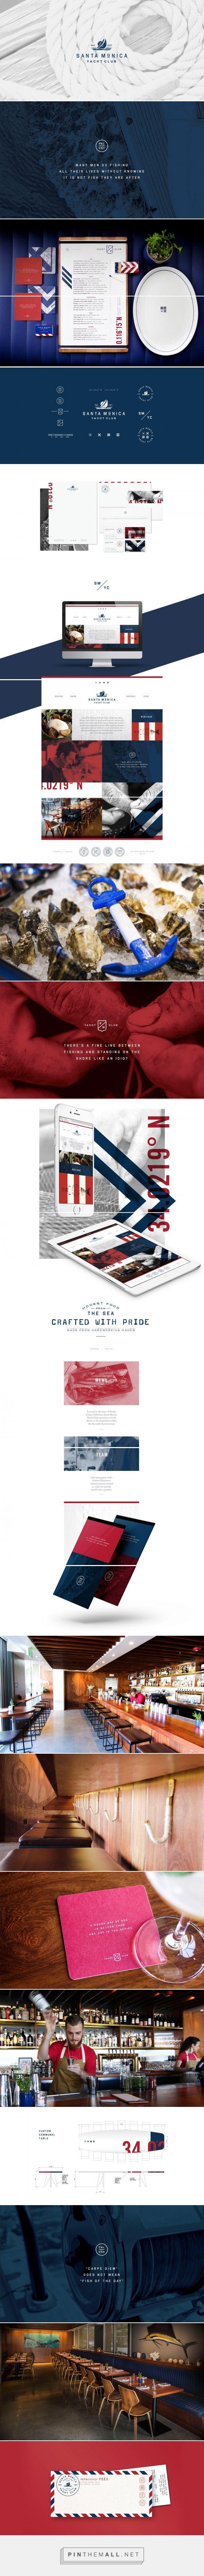 Santa Monica Yacht Club Branding and Menu Design by Farm Design | Fivestar Branding Agency – Design and Branding Agency & Inspiration Gallery